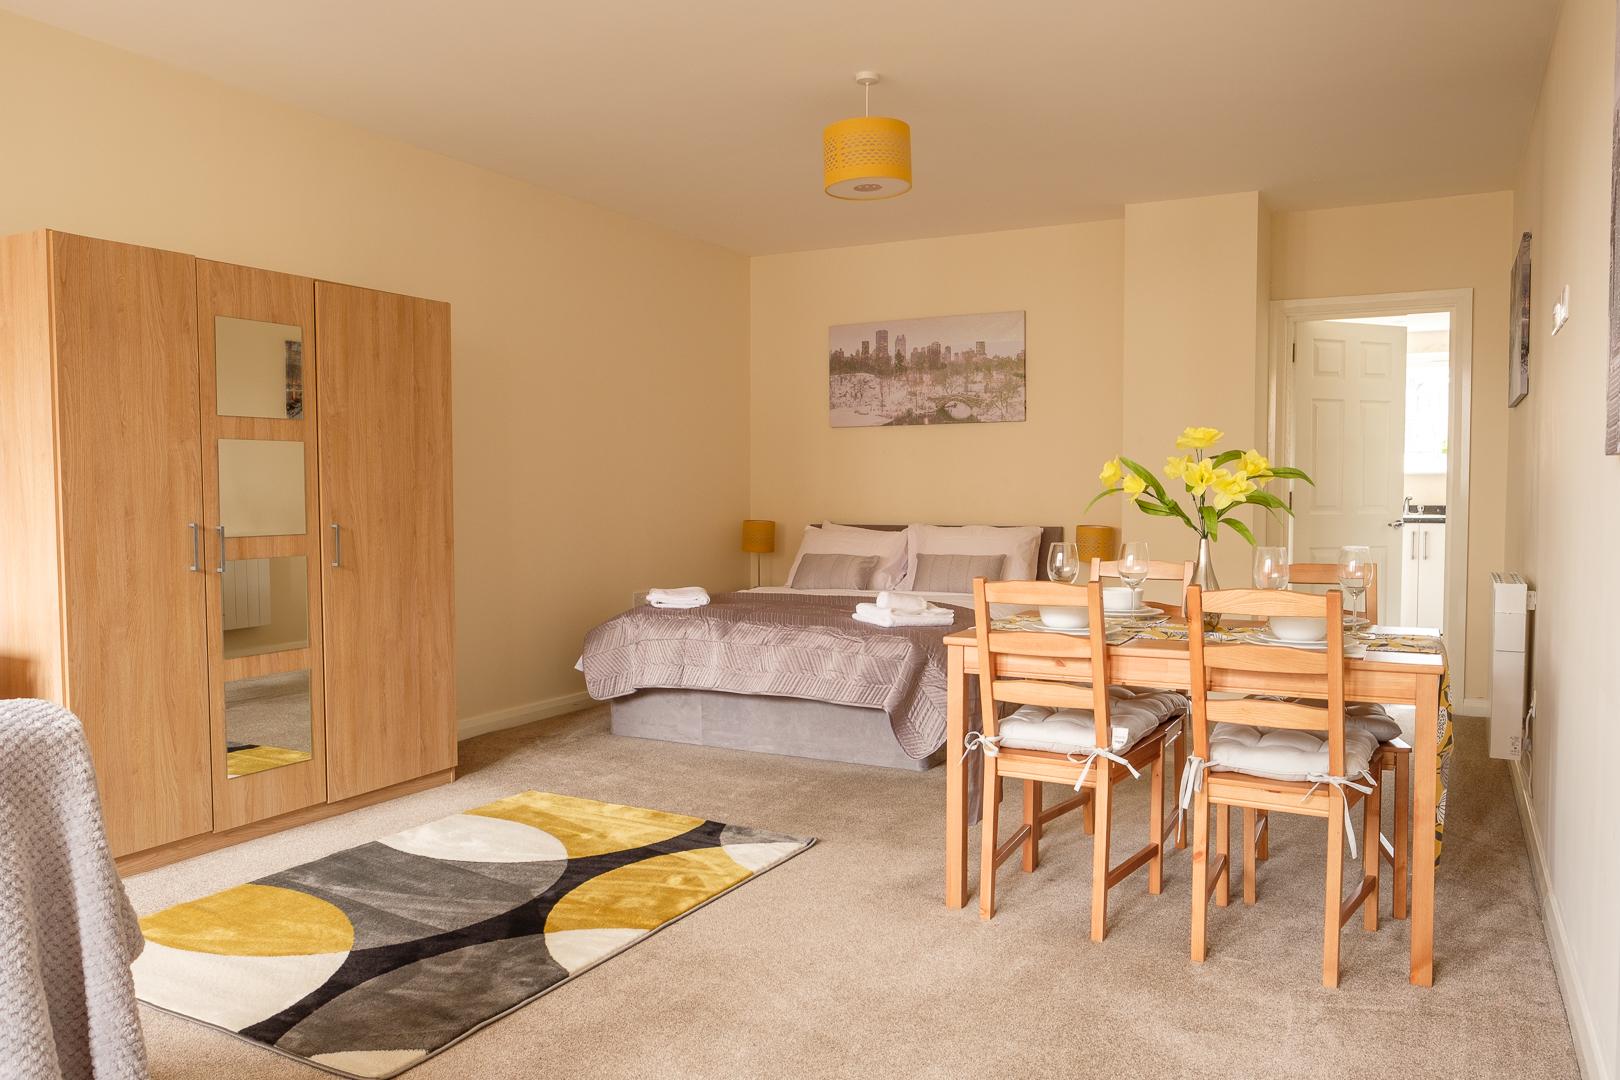 Bed at Broadwalk Apartment, Centre, Crawley